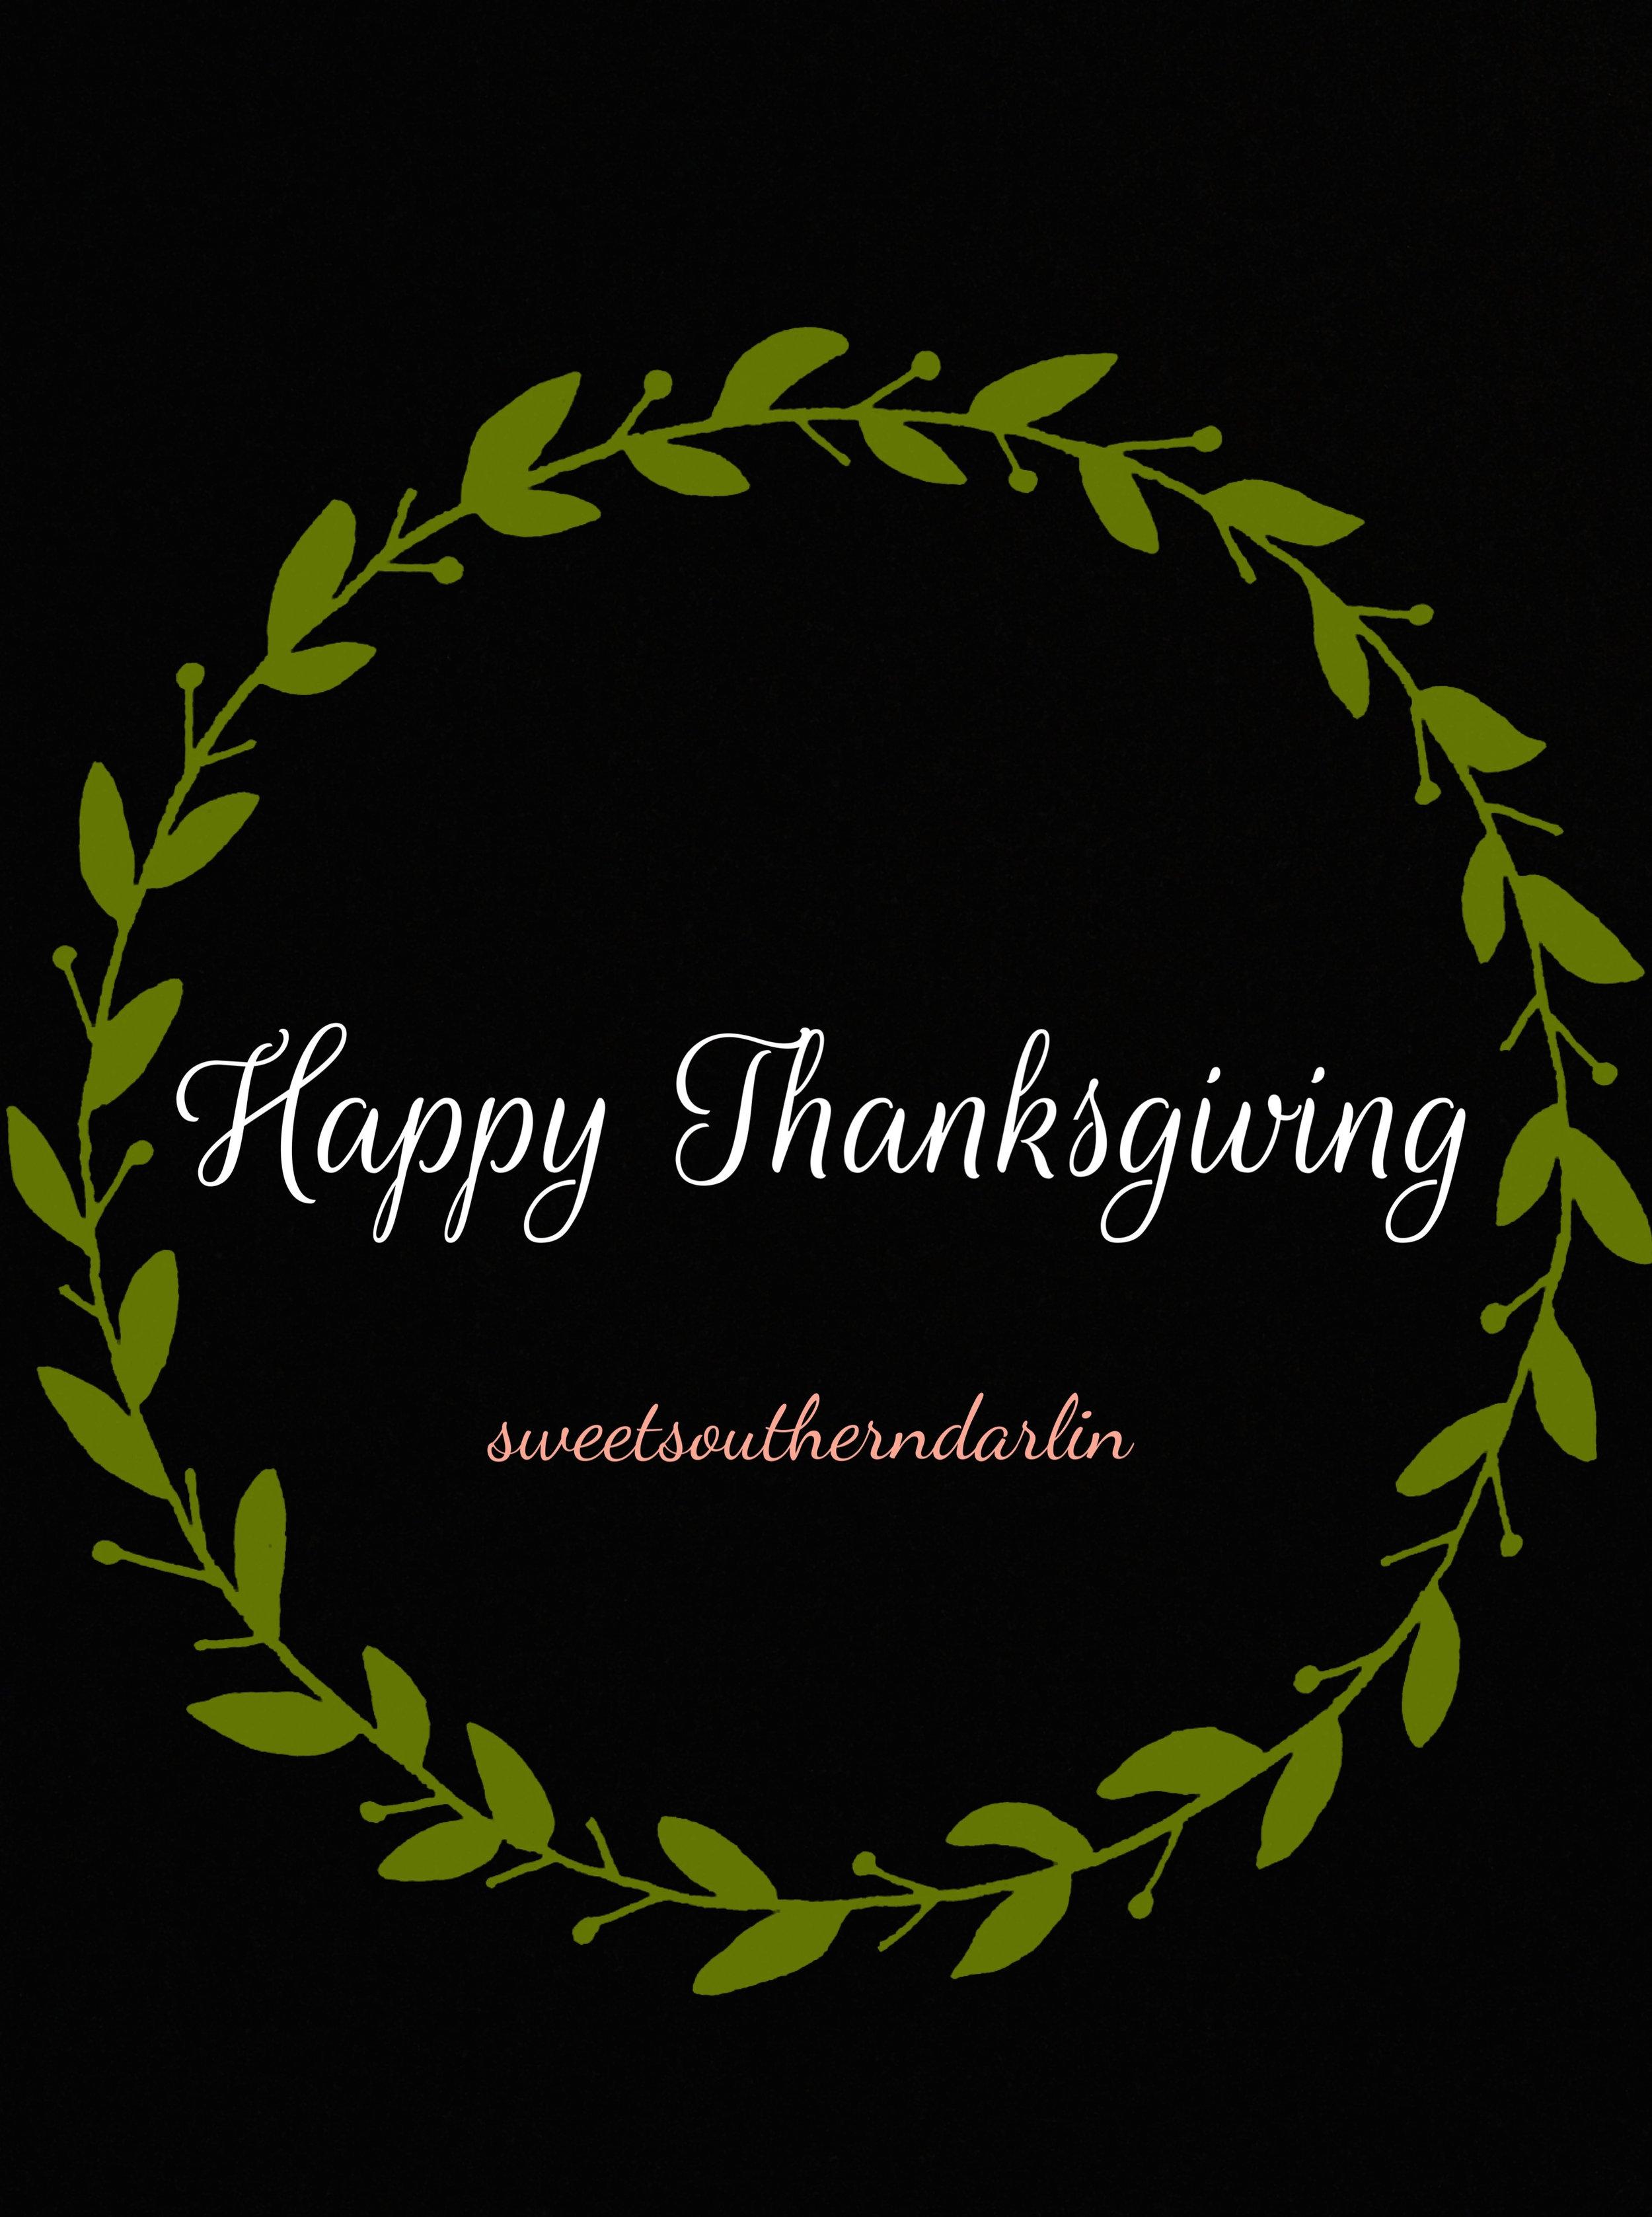 thanksgivign ssd .jpg